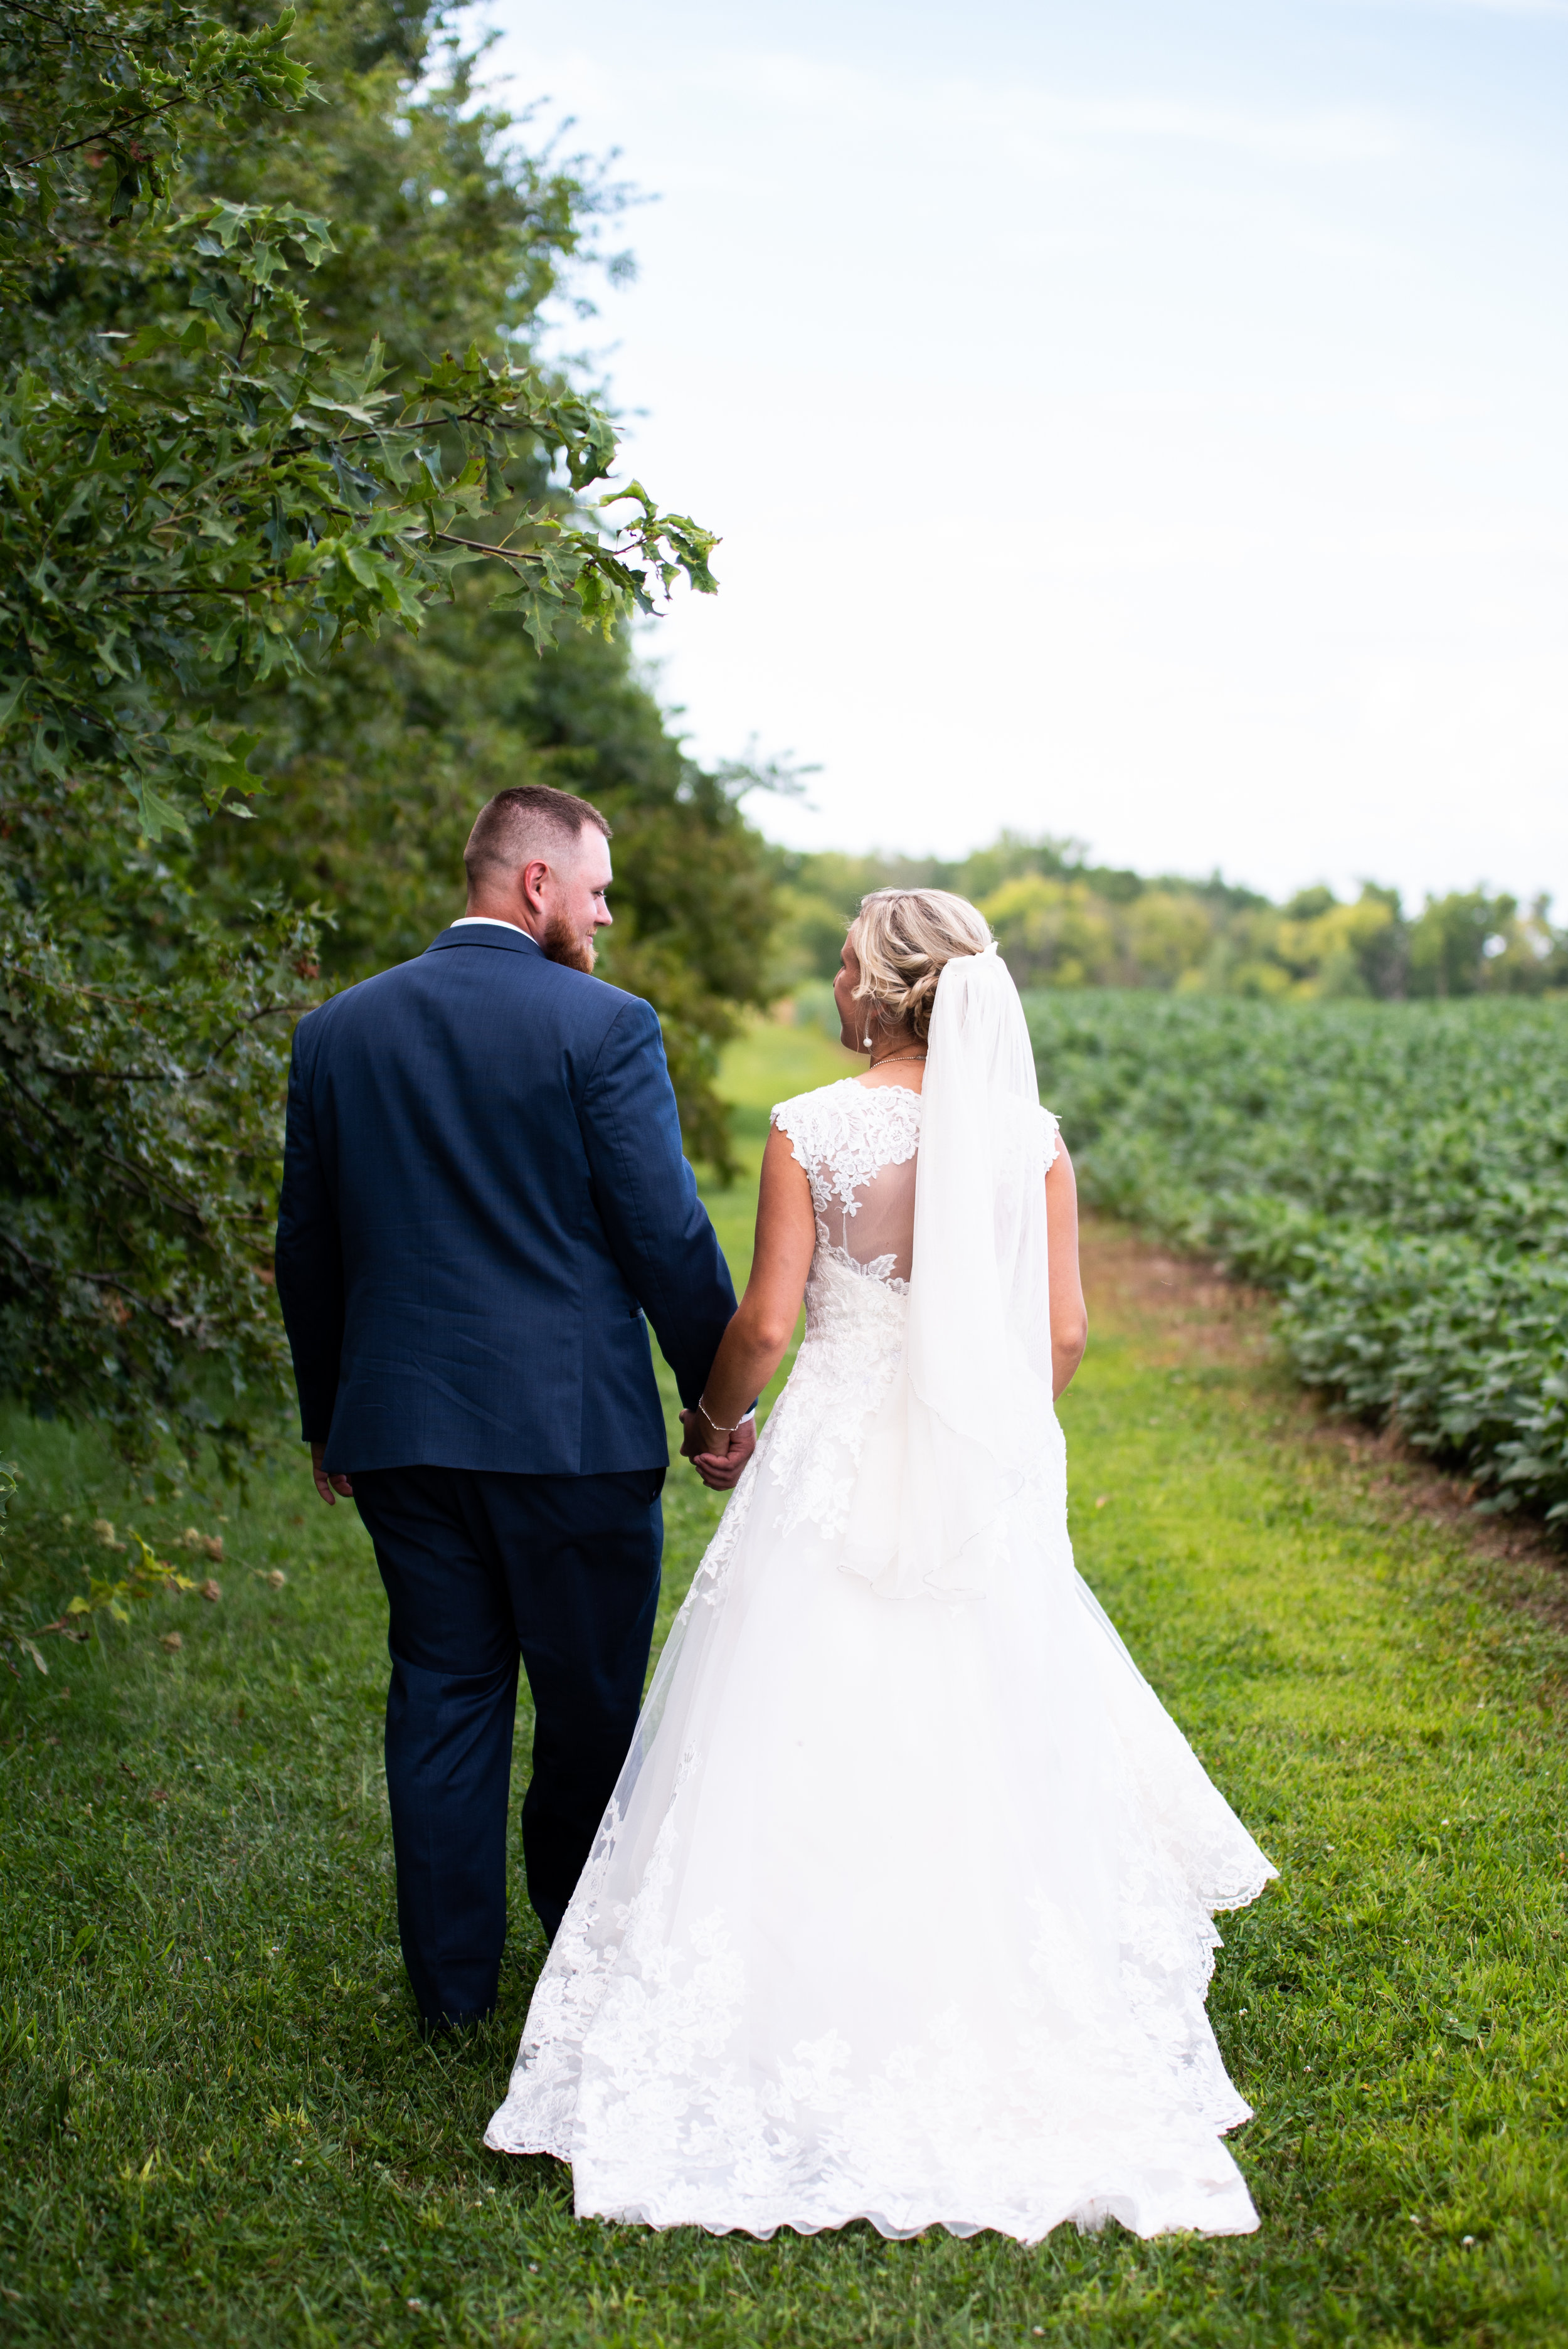 wedding (1 of 1)-181.jpg